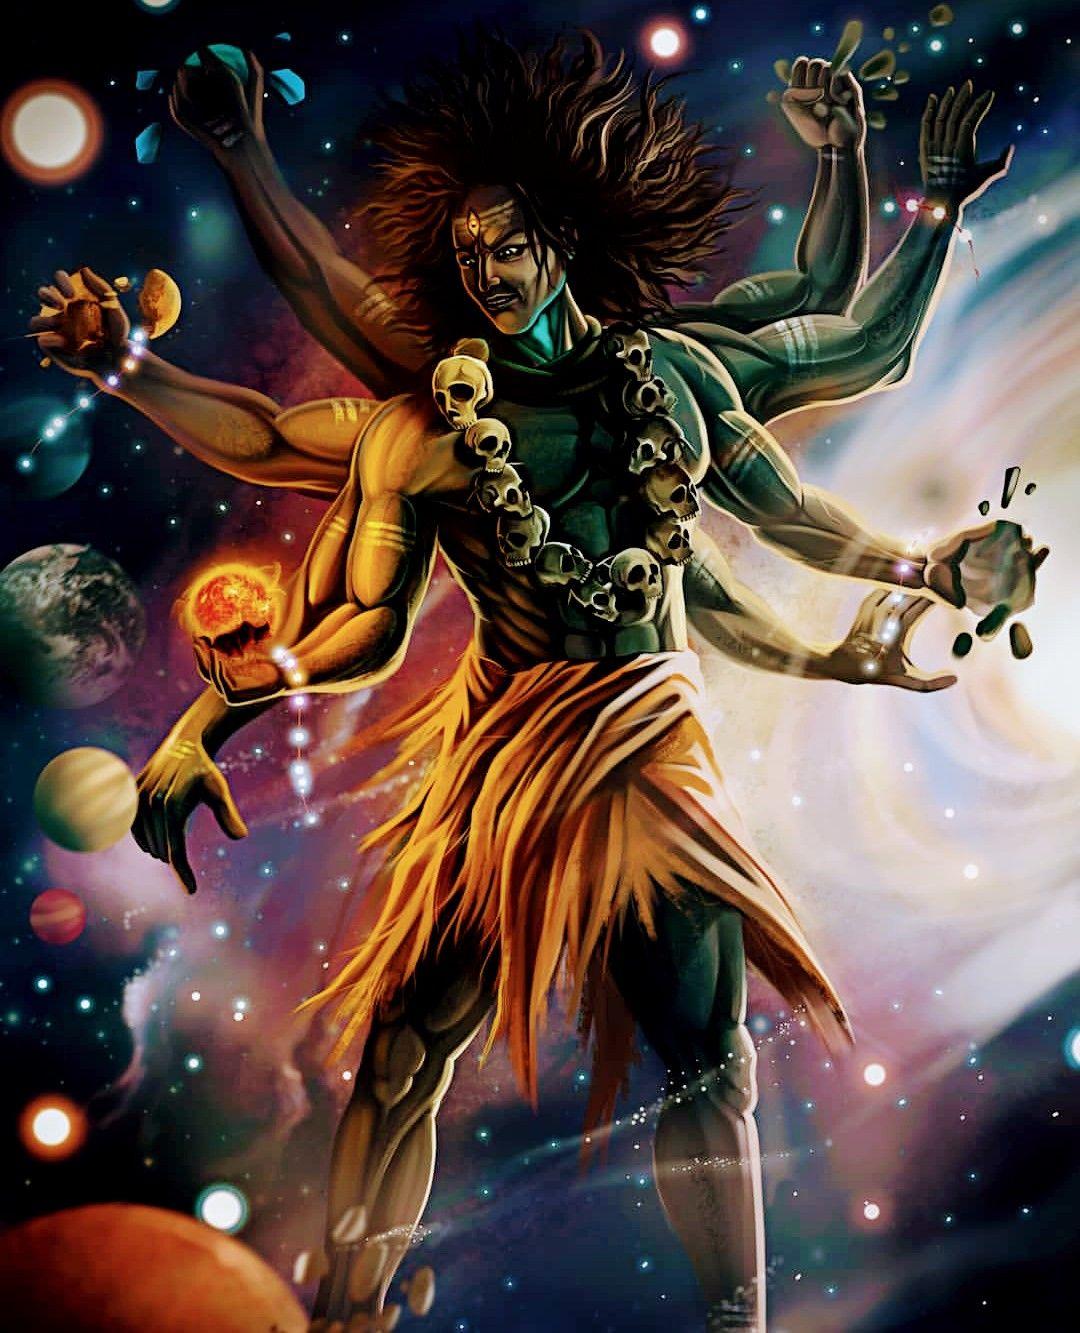 Mahakal Hd Wallpapers Images Shiva Angry Shiva Tandav Shiva Wallpaper